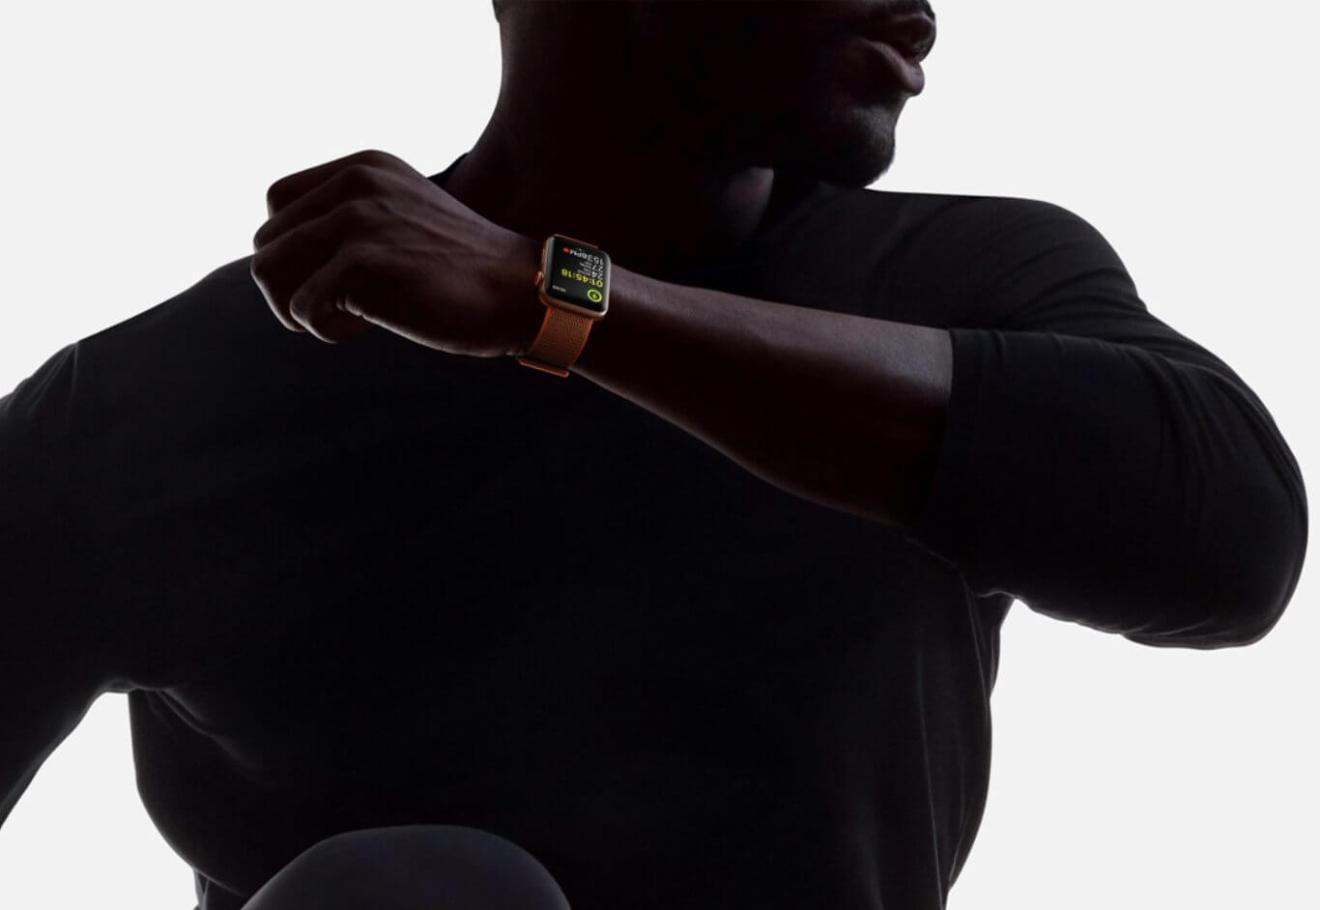 73BC4F71 084B 42AC A453 A014036AAFF2 - Vale a pena comprar um Apple Watch em 2018?